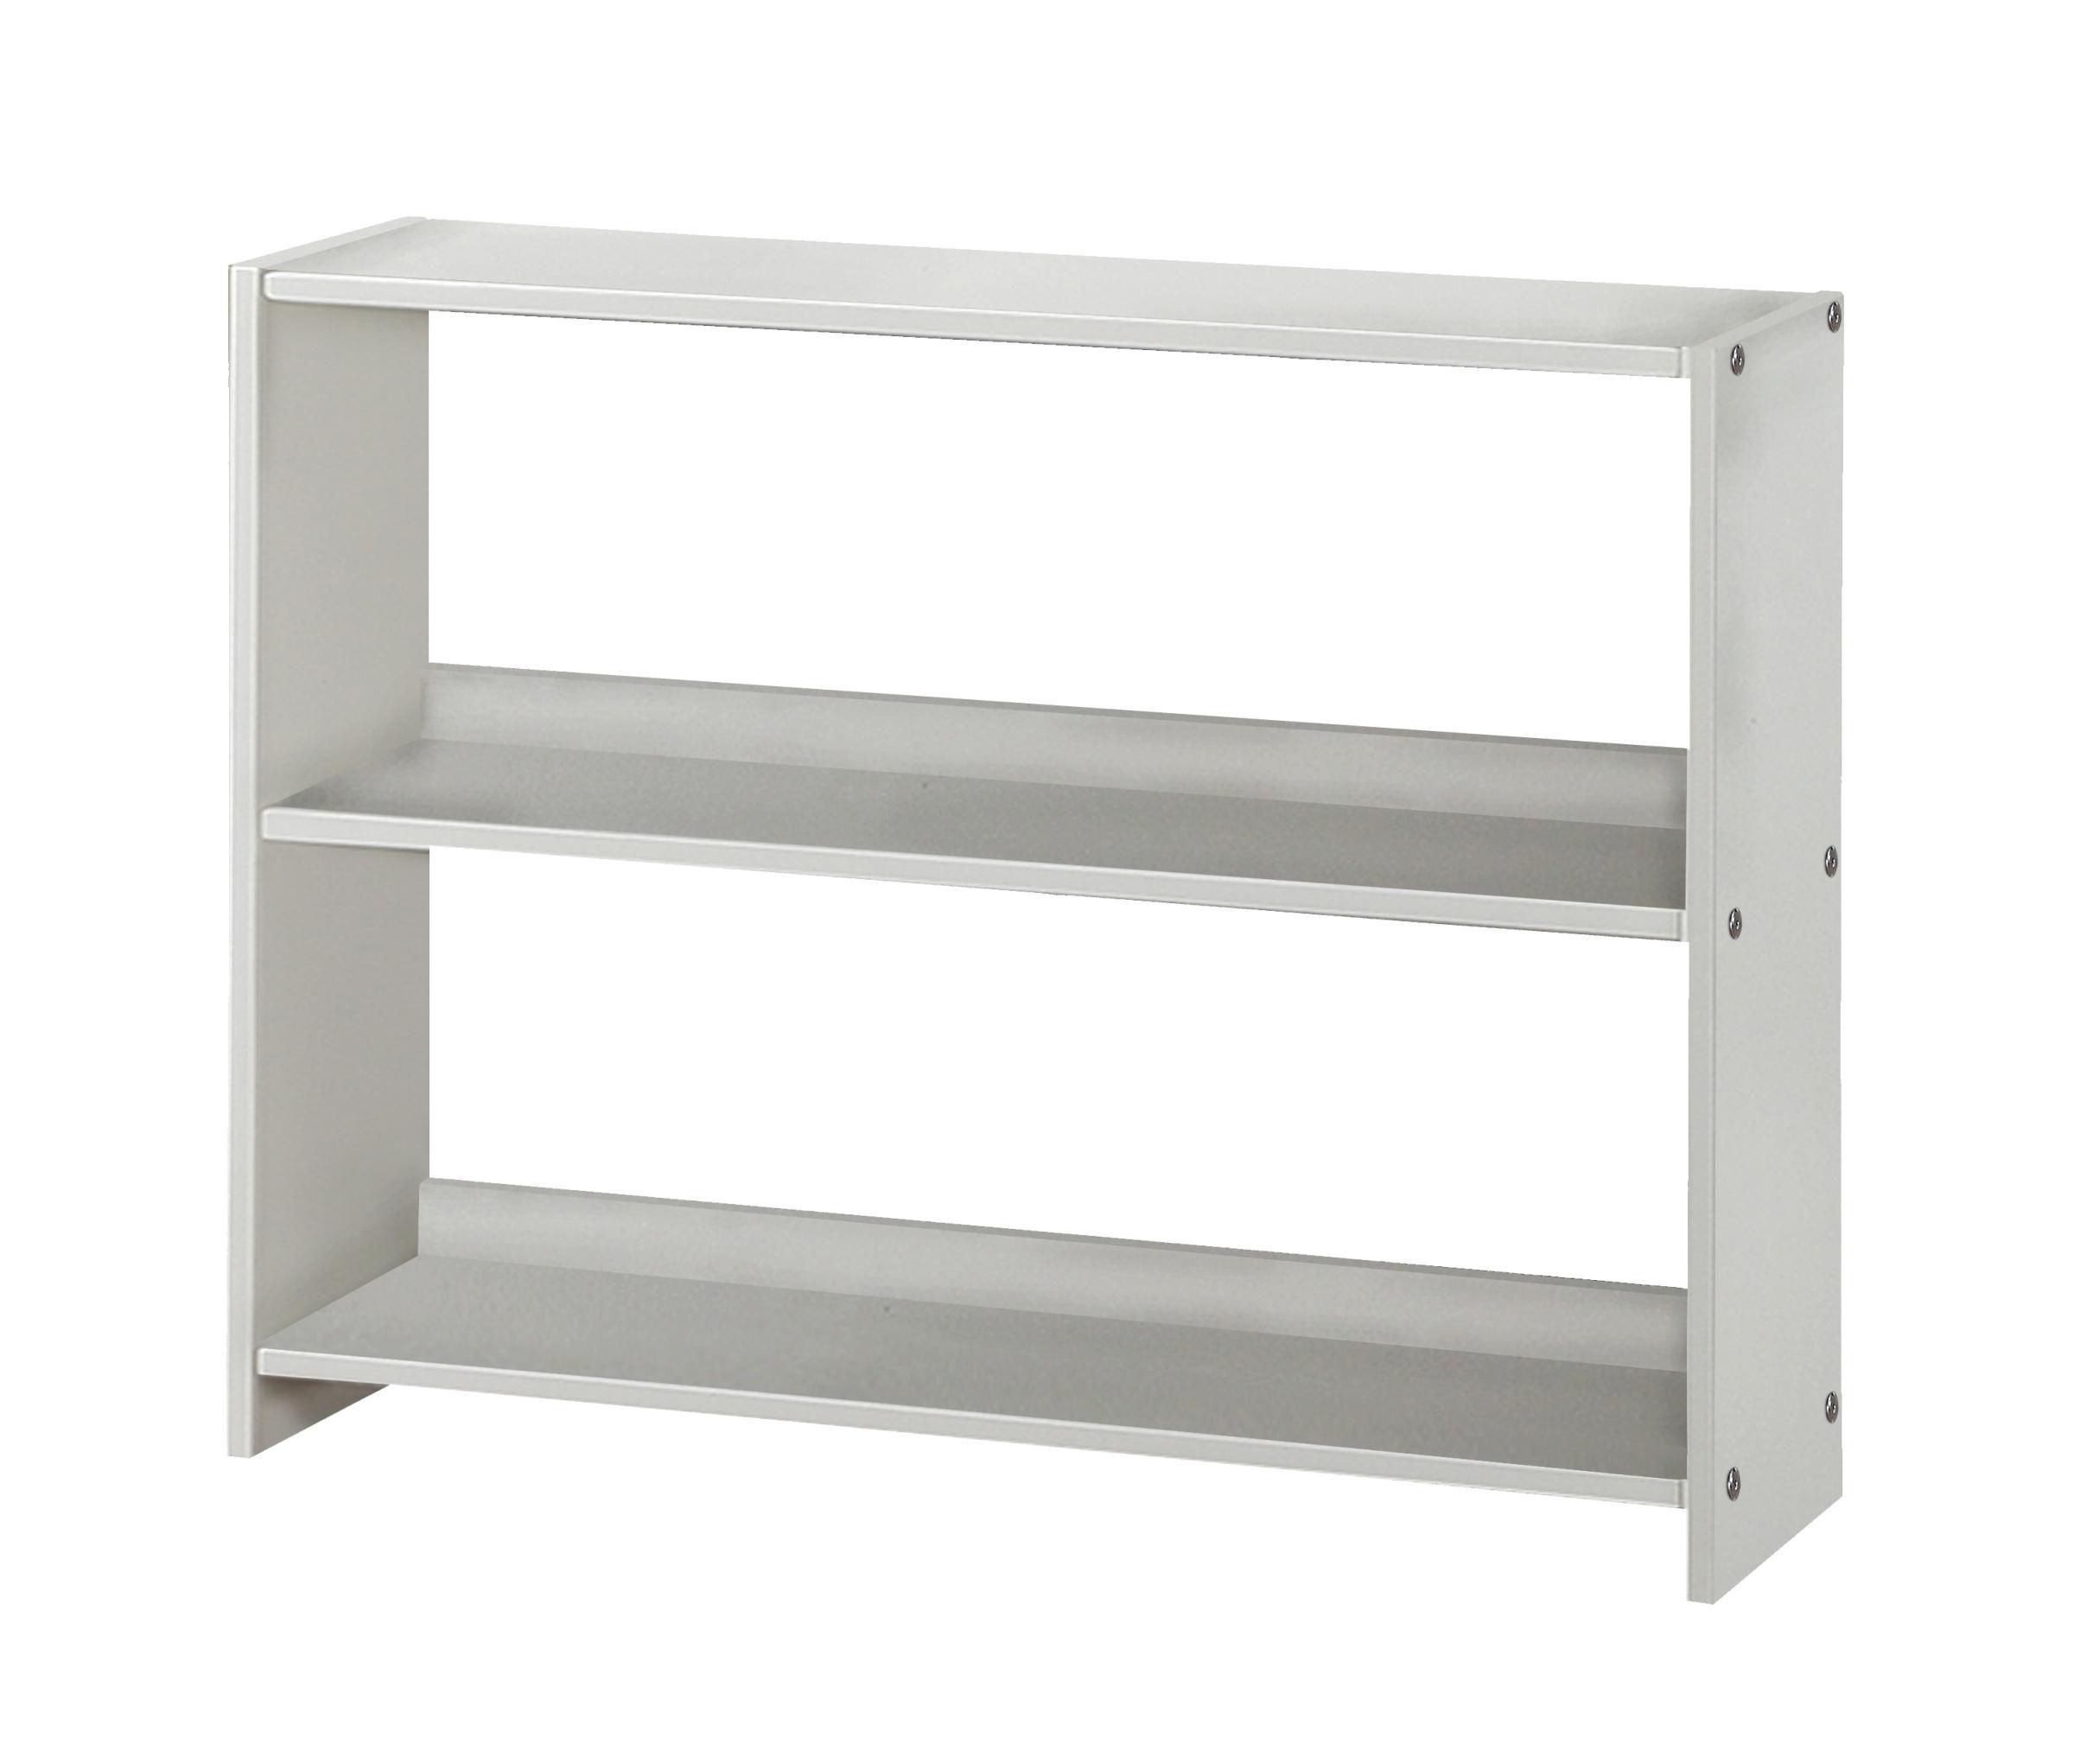 Pivot Direct Louver Bookcase In White Finish PD_795DW